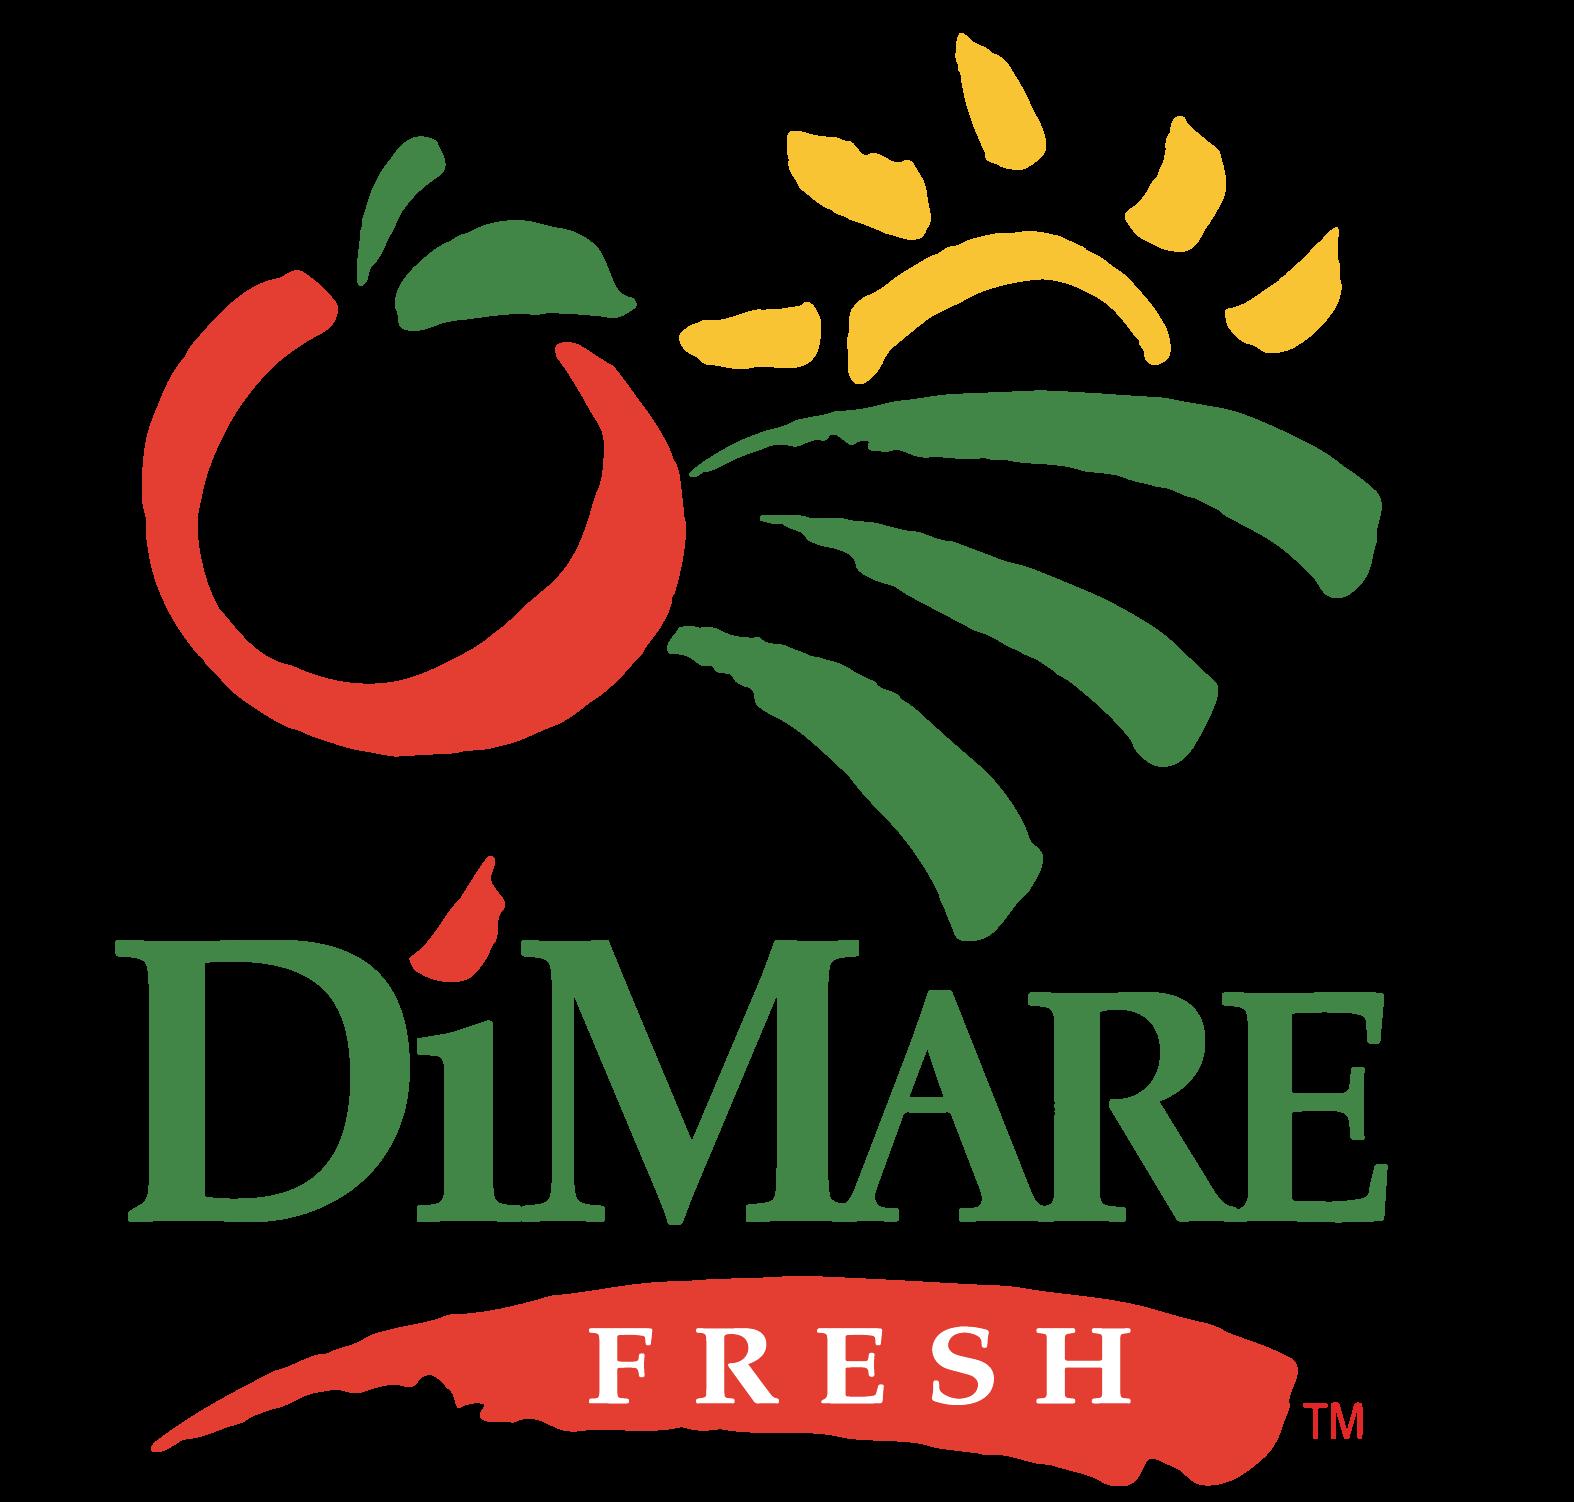 DiMare Fresh Logo